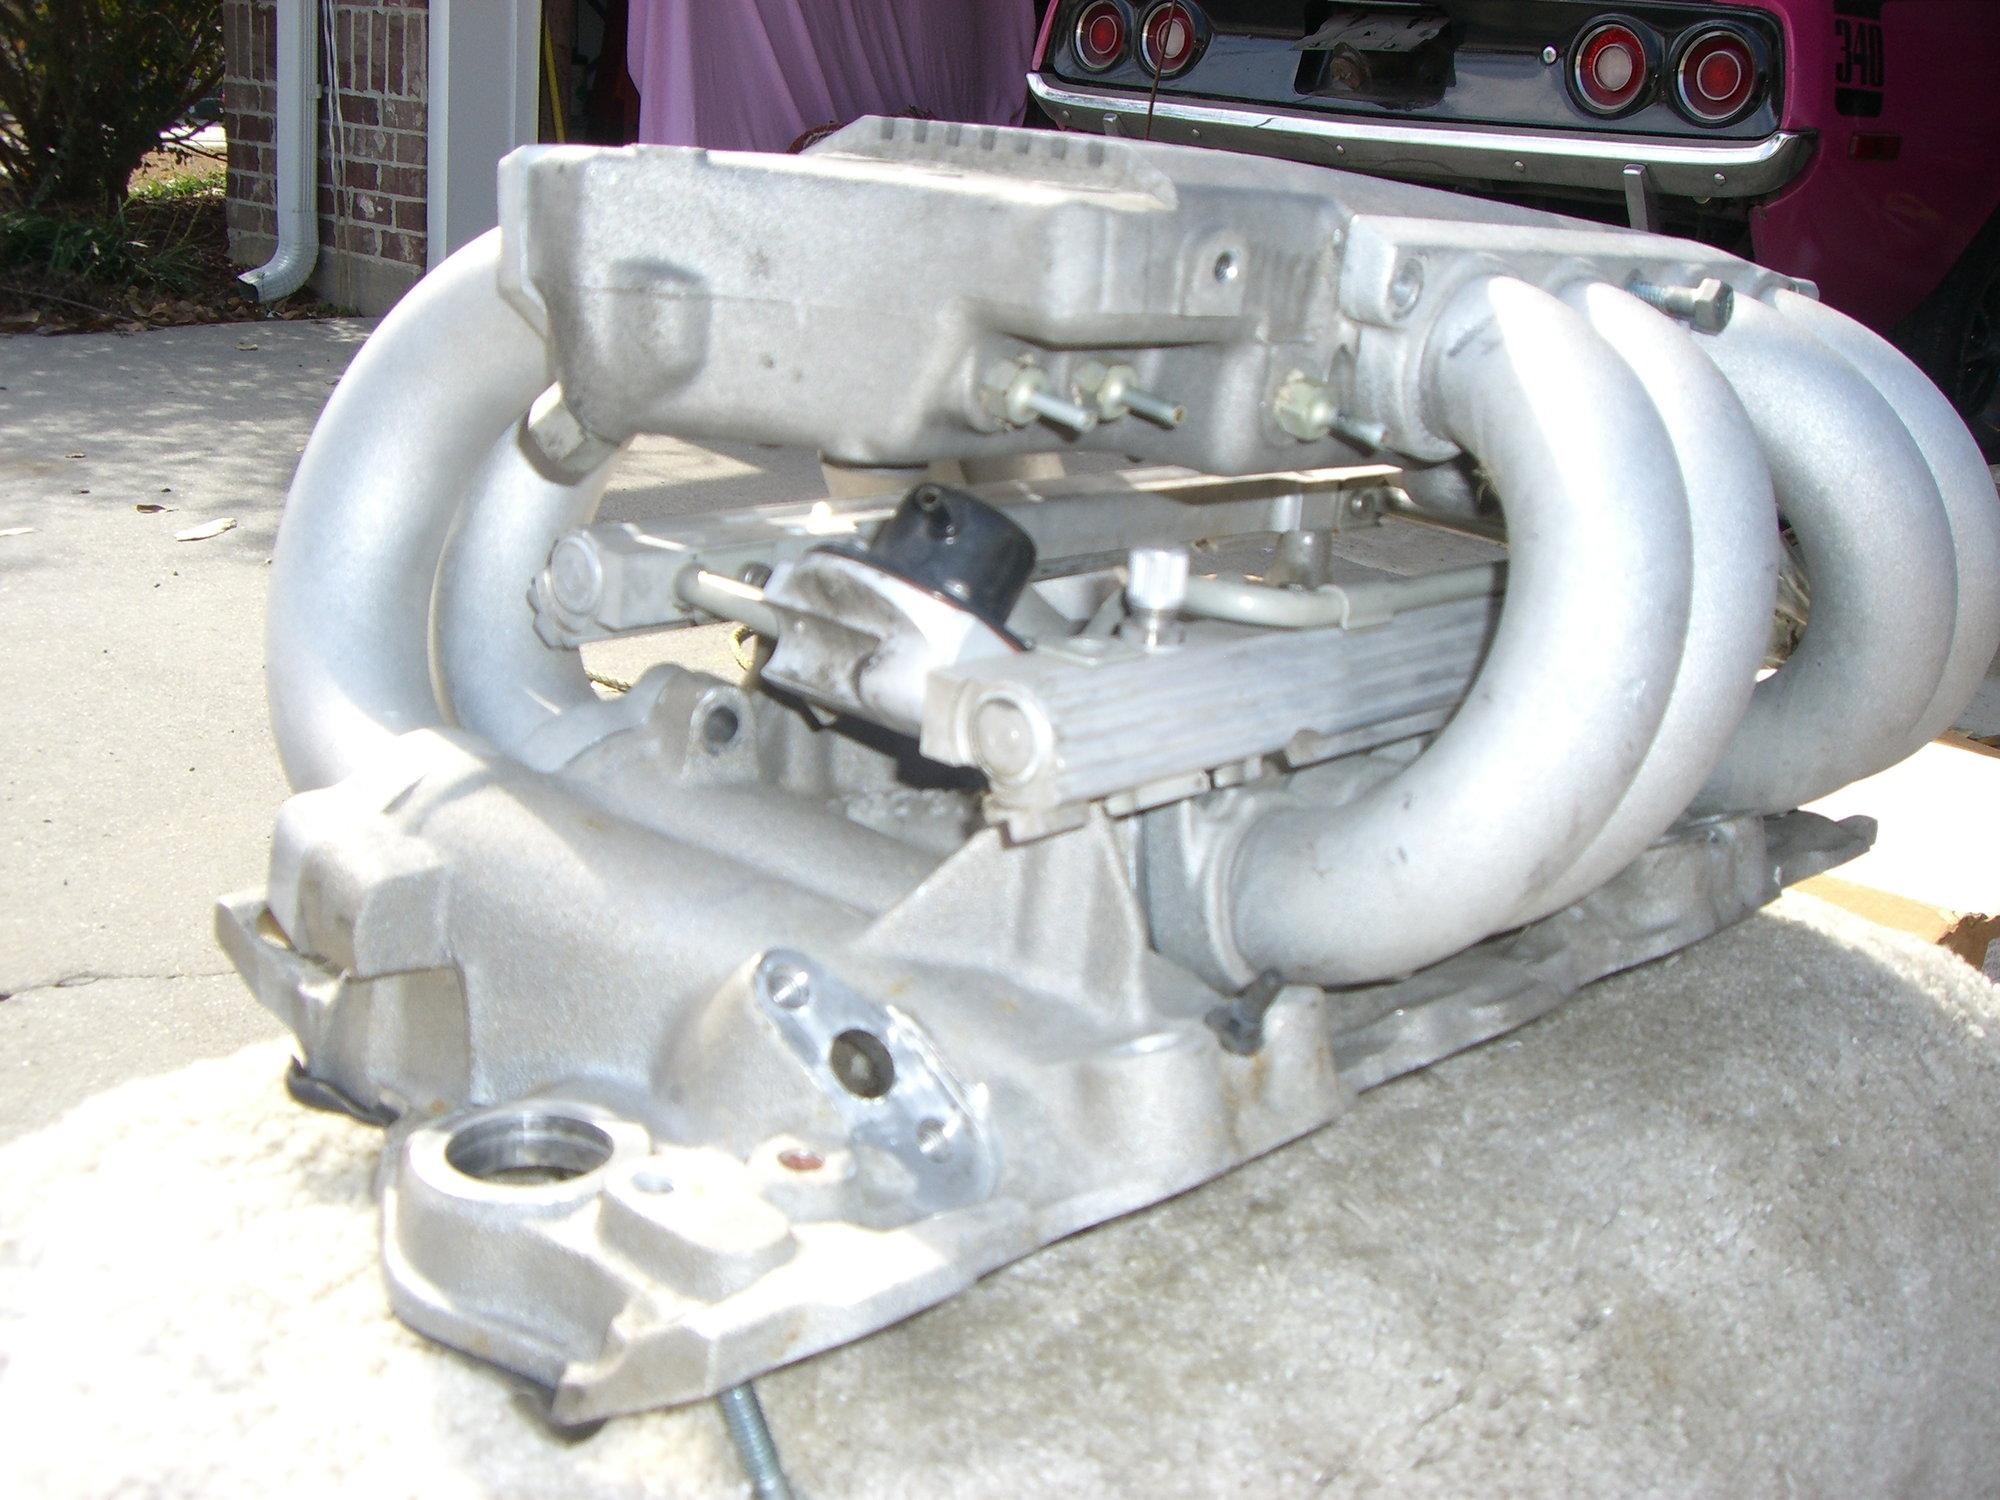 FS (For Sale) 1990 Intake & Steering Wheel